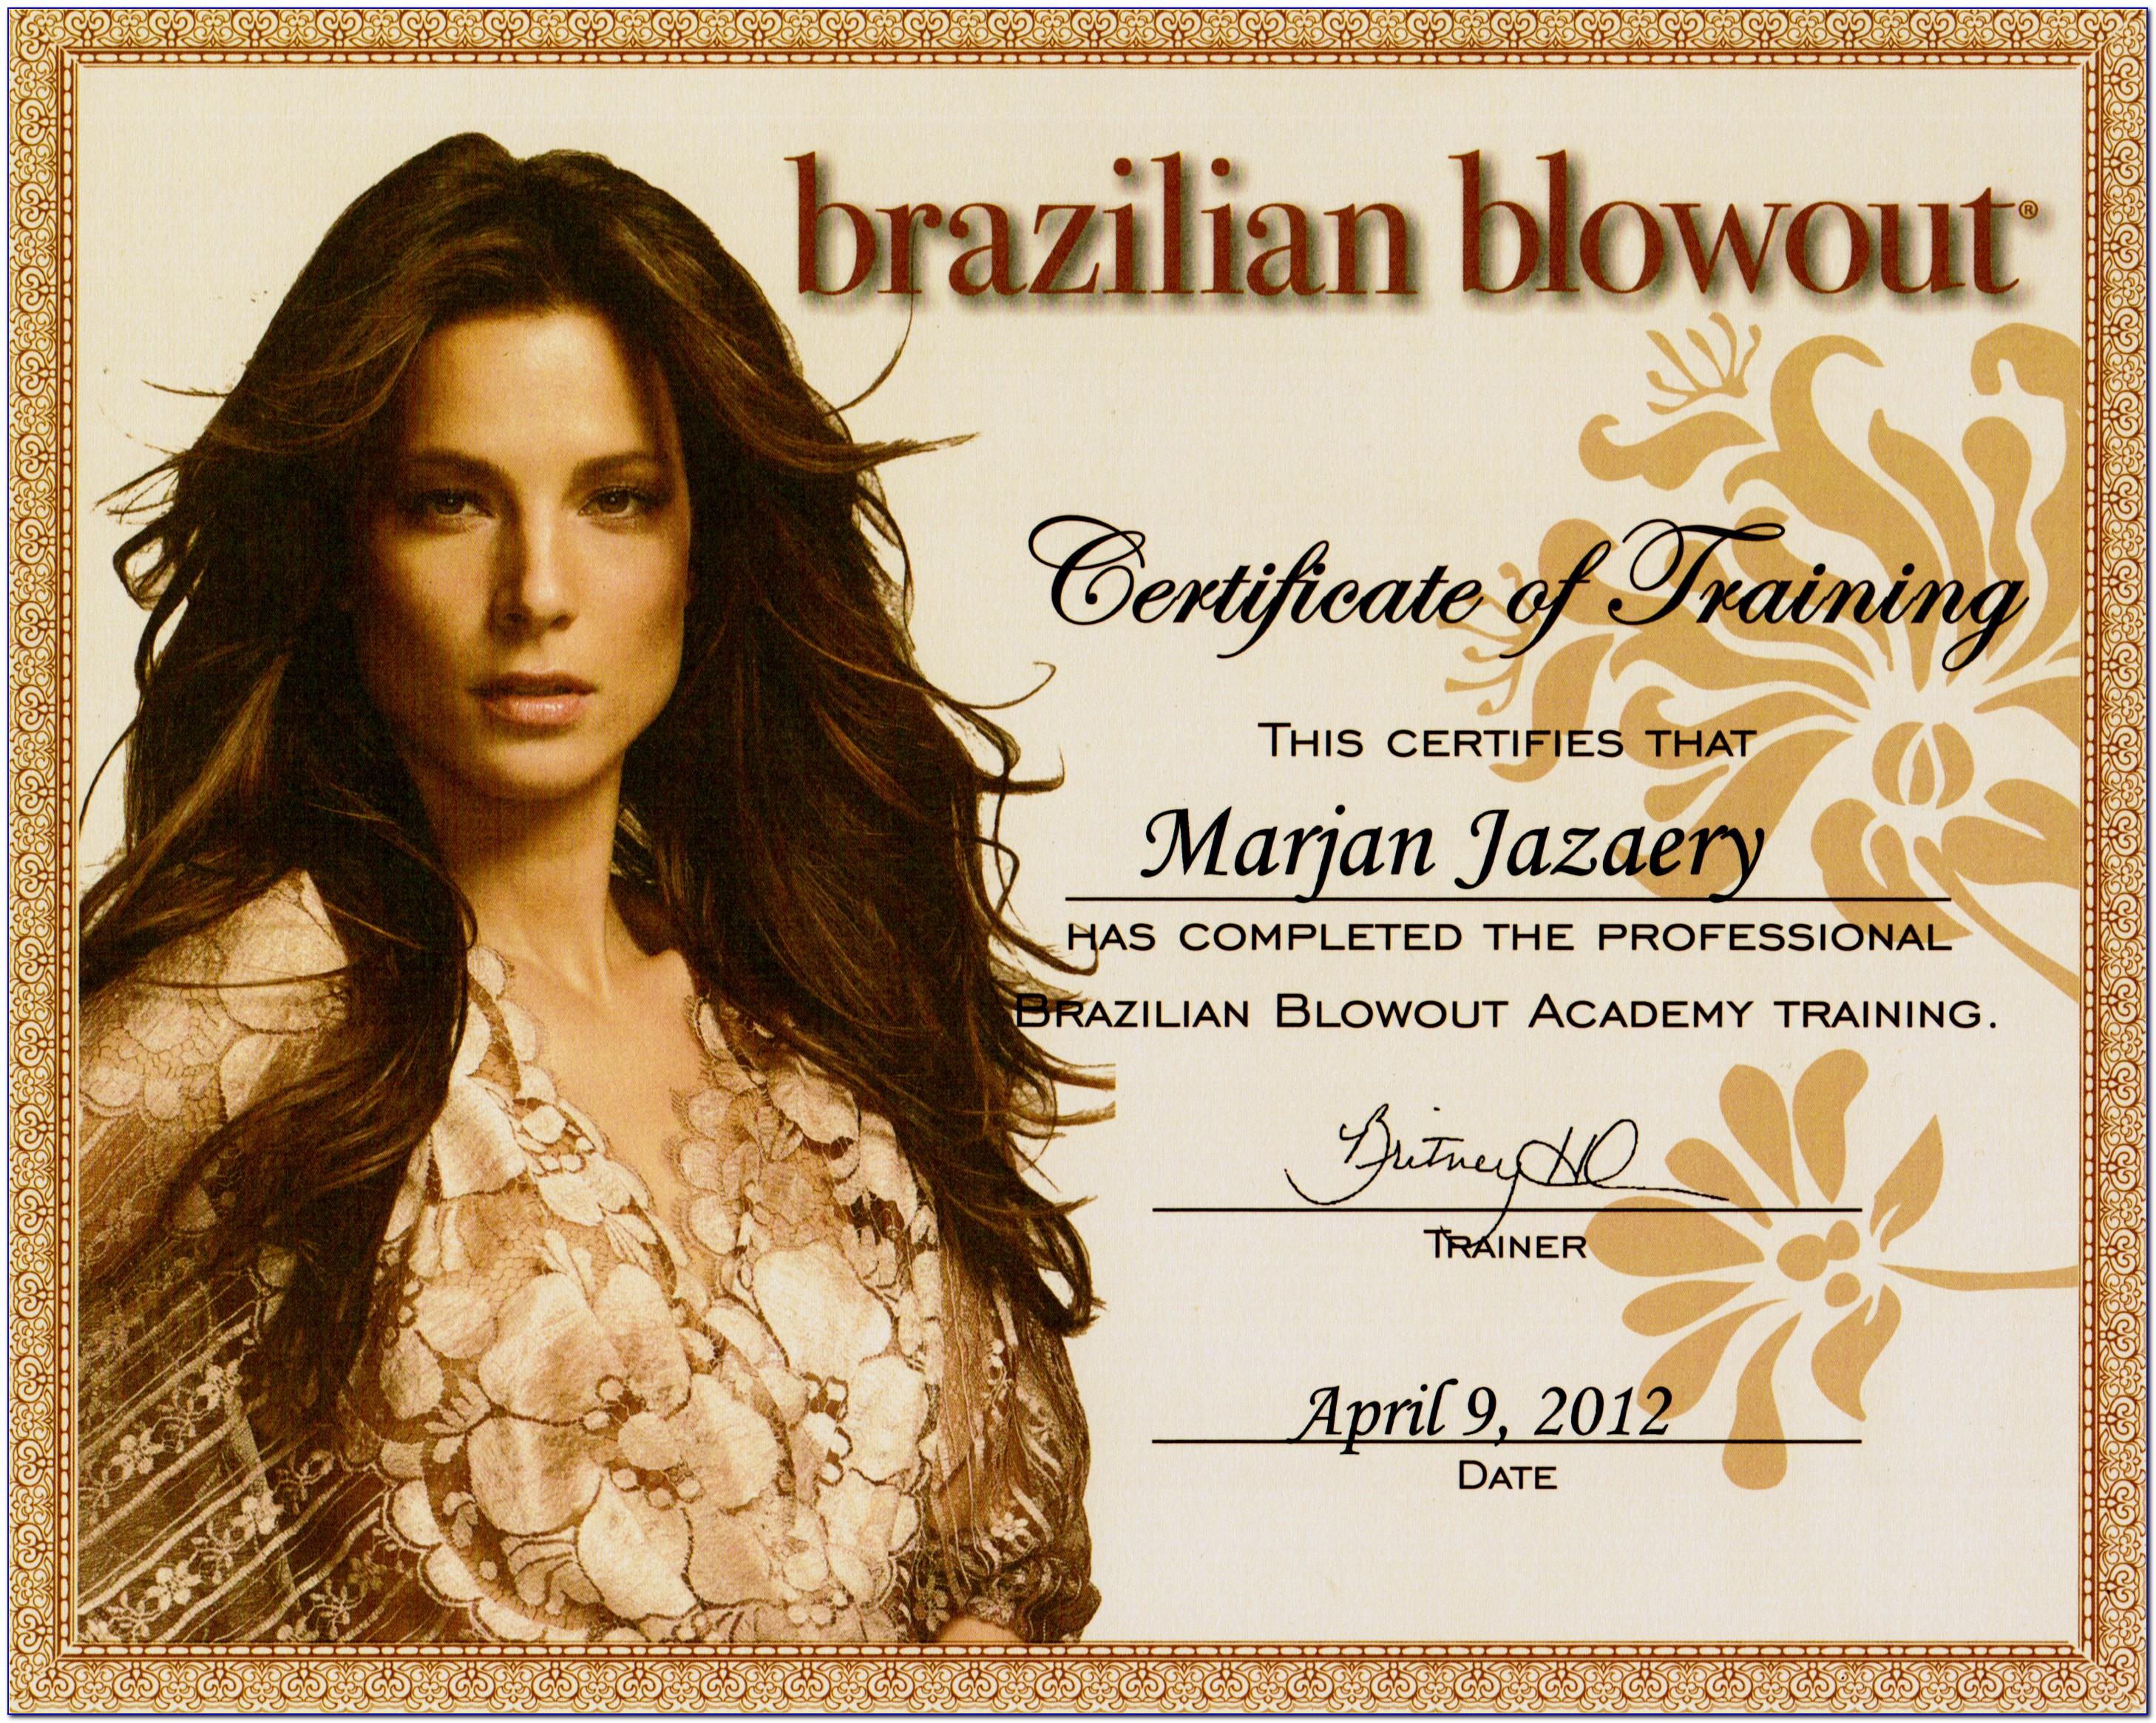 Brazilian Blowout Certification Video